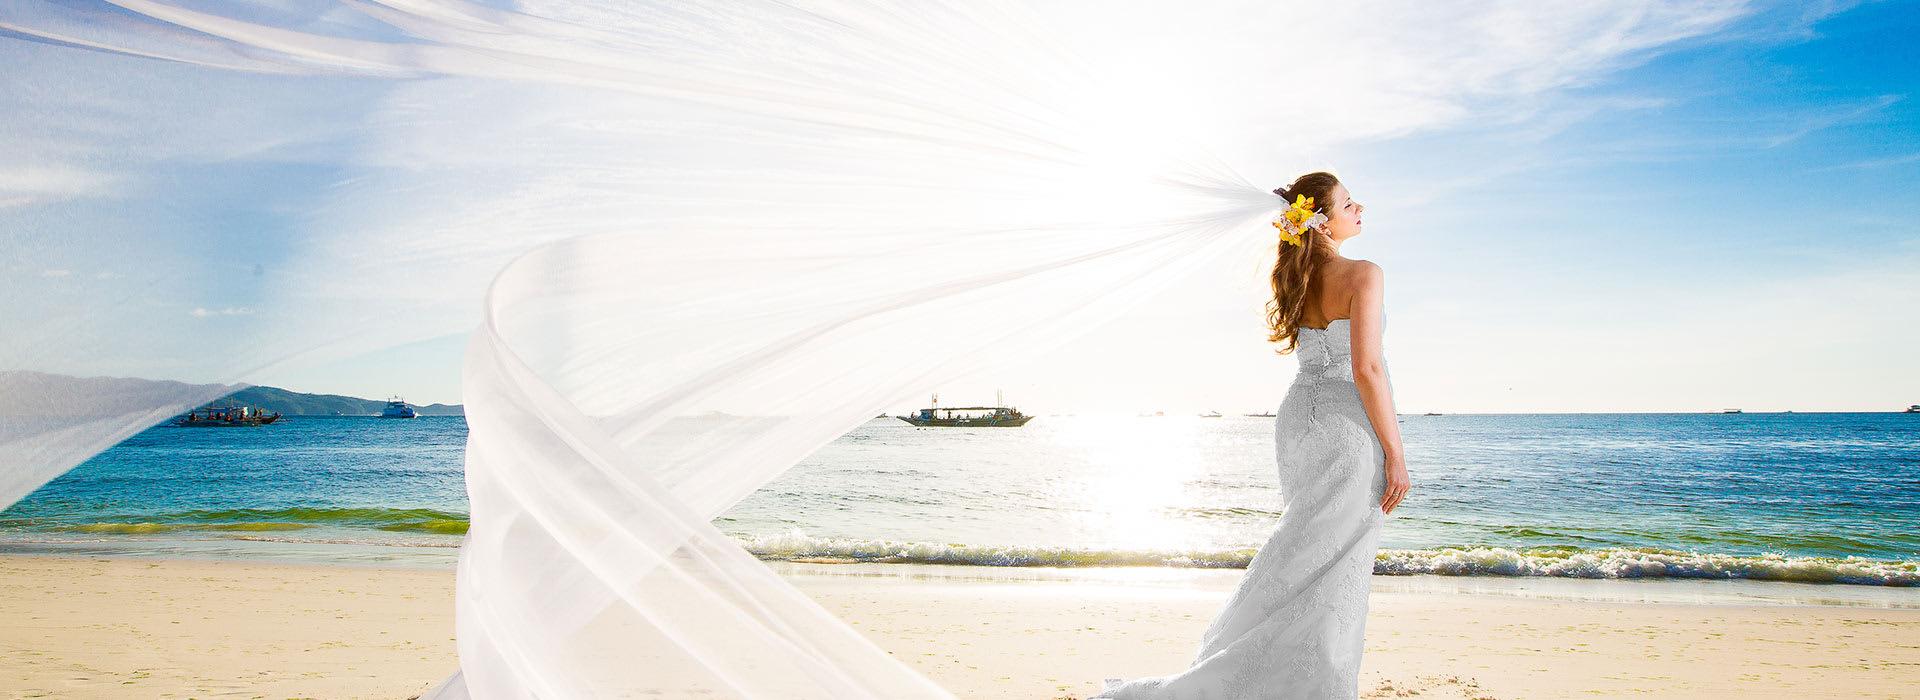 AVANI Bentota a luxury wedding hotel in Sri Lanka